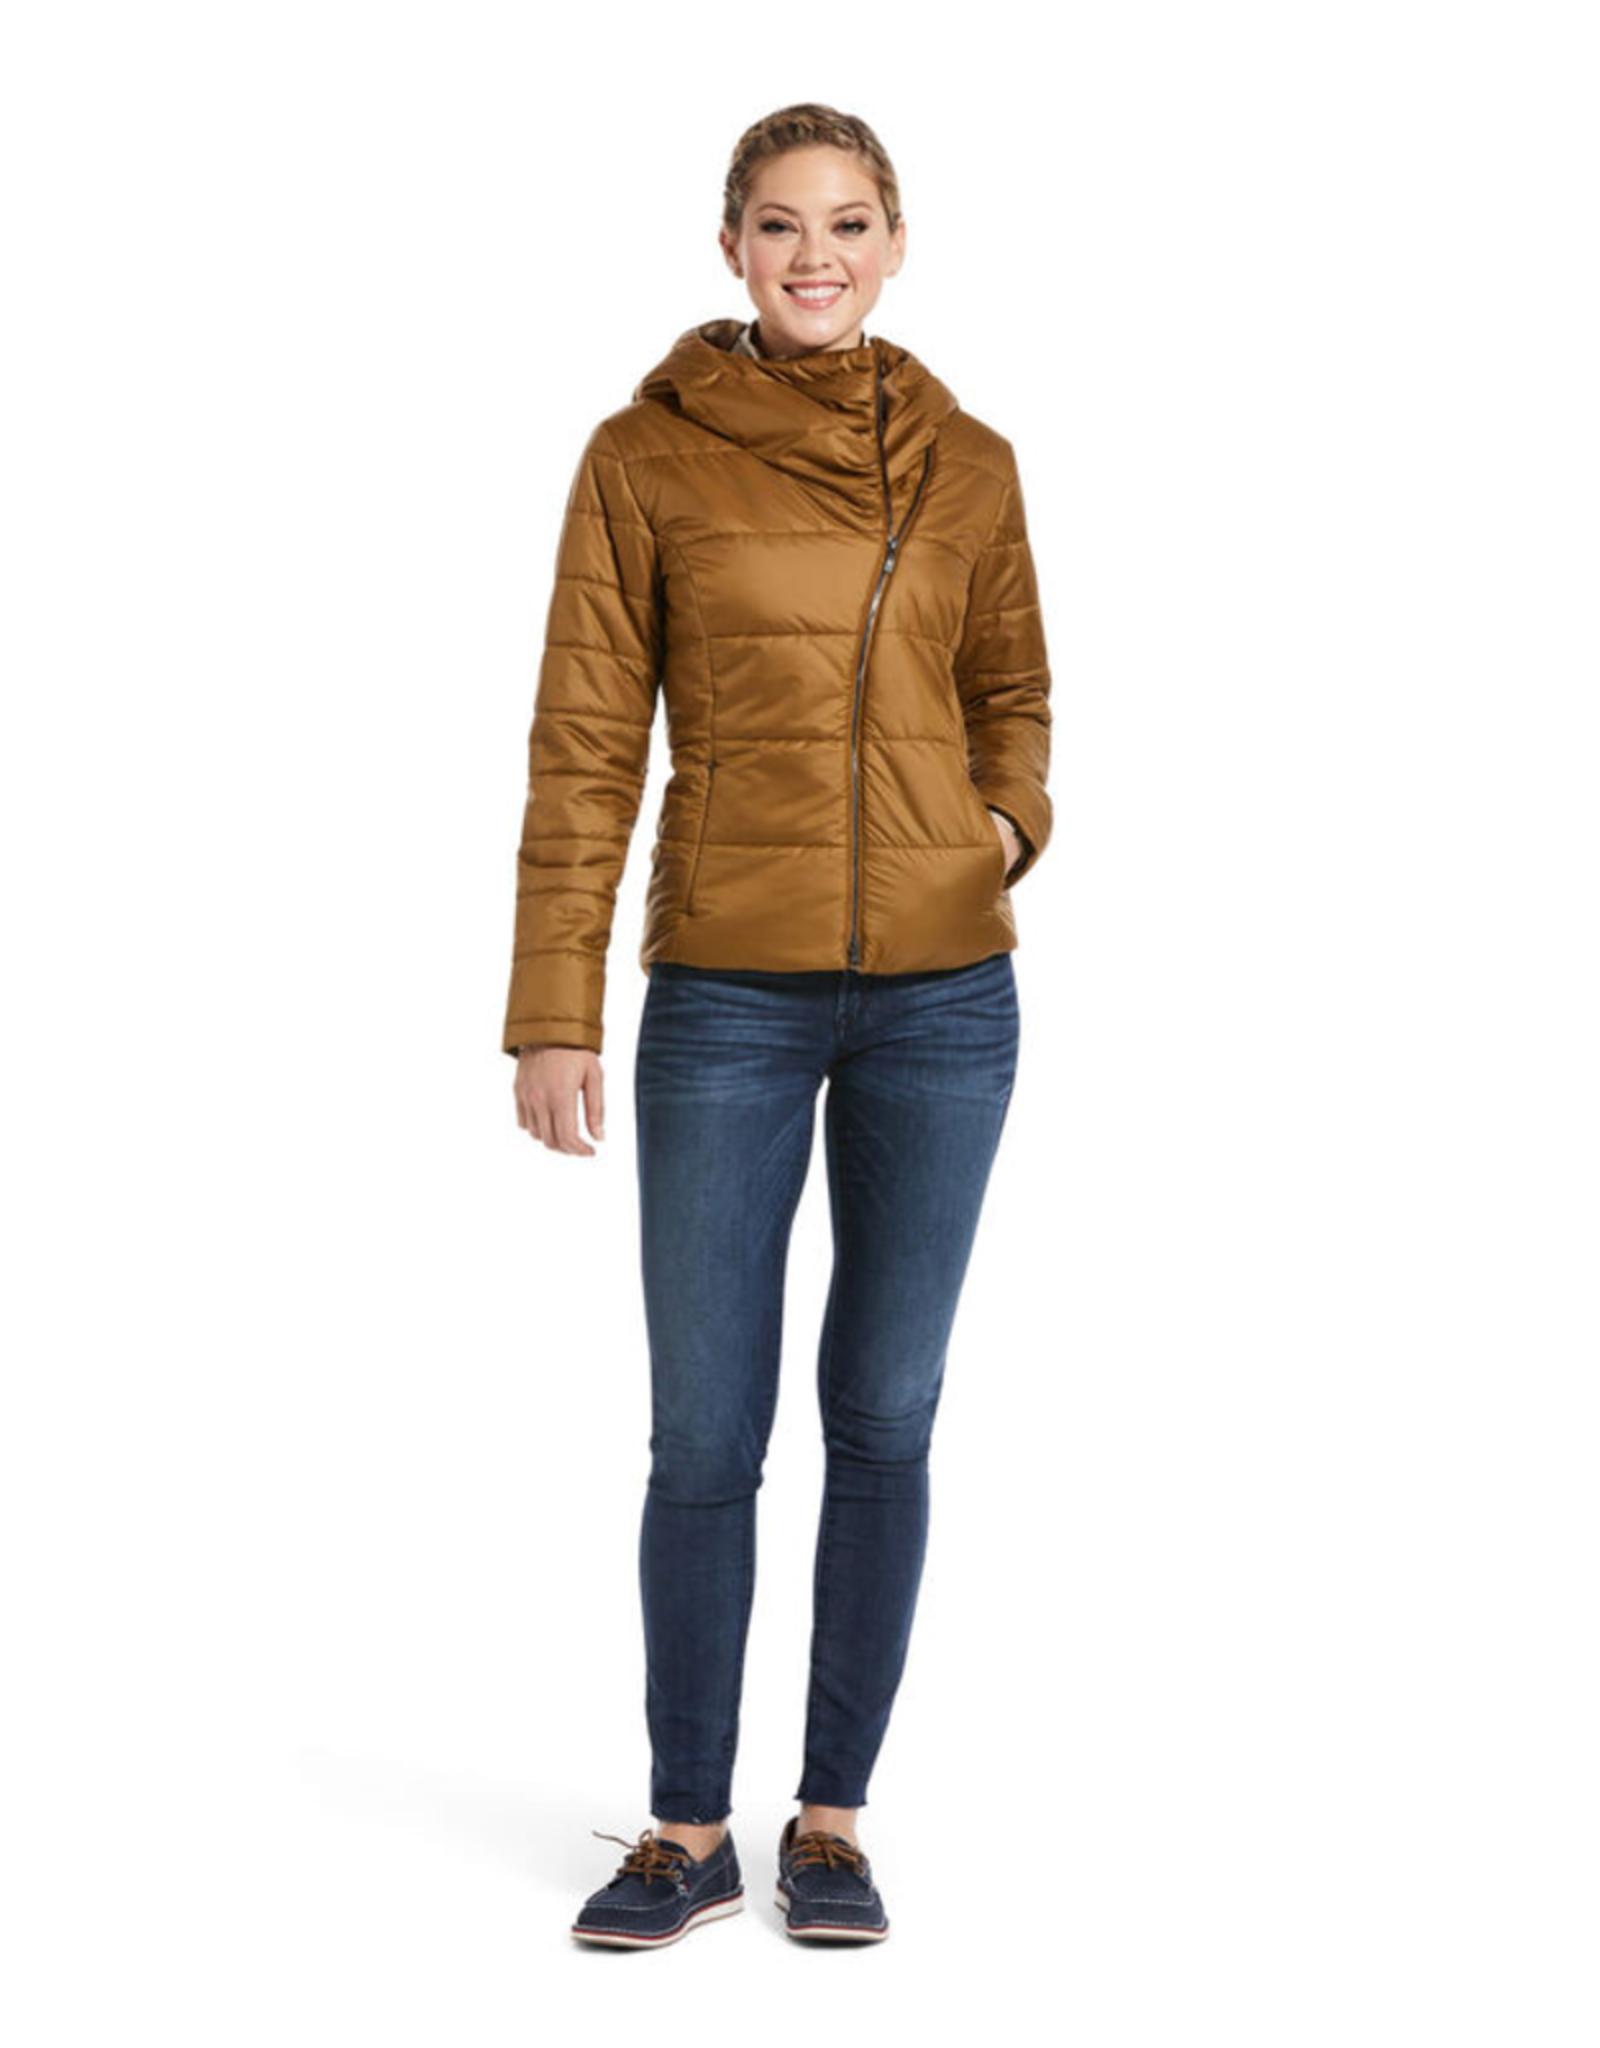 Ariat Ariat Kilter Insulated Jacket